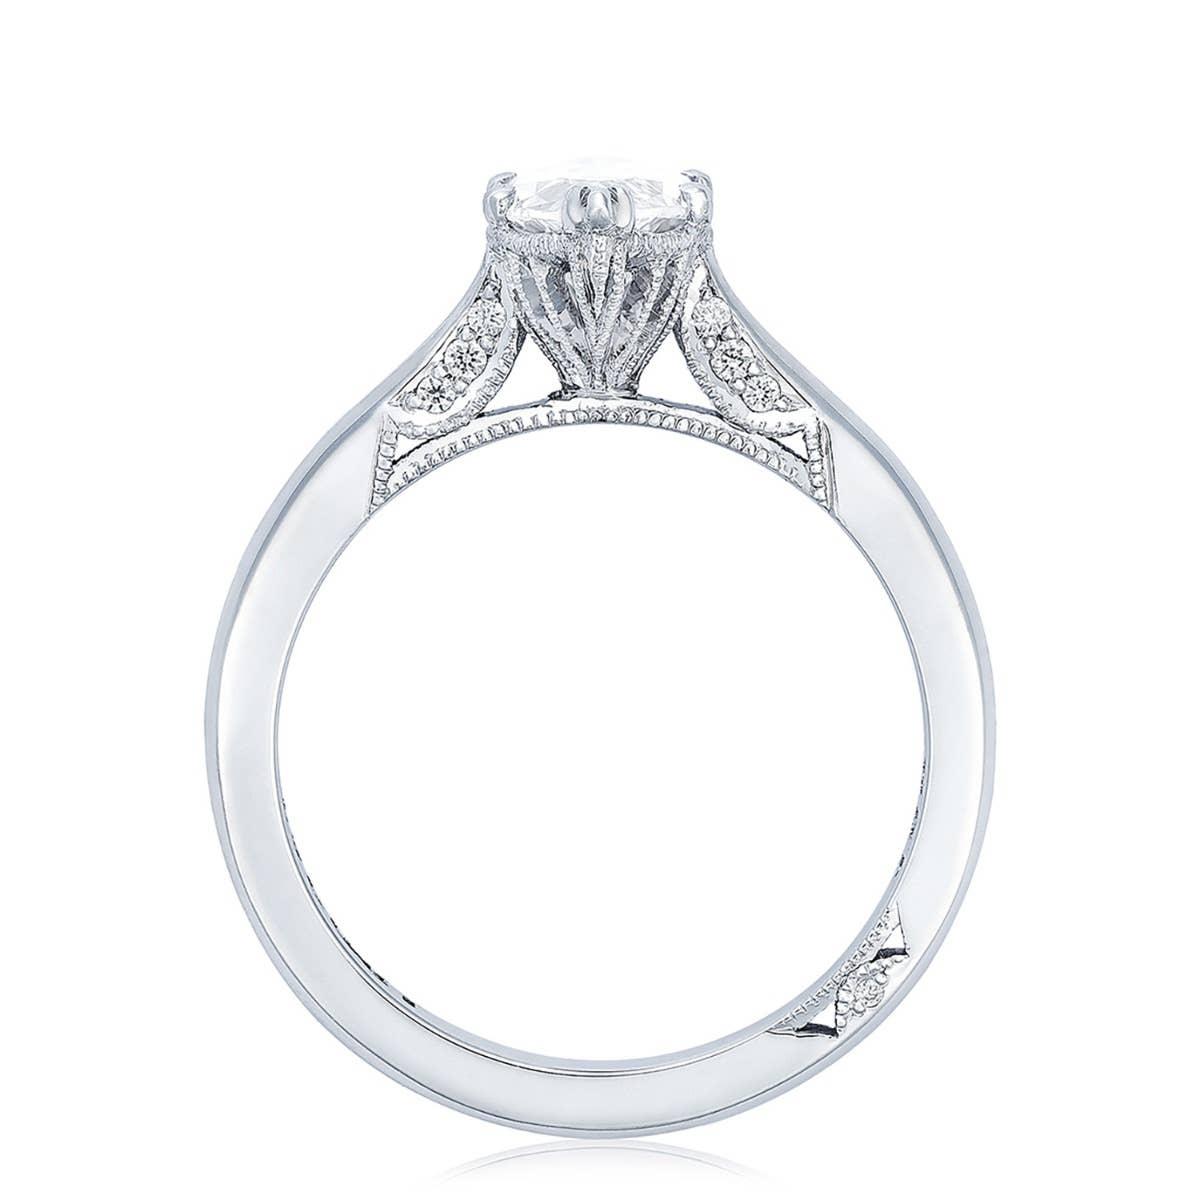 Tacori Engagement Rings - 2650mq